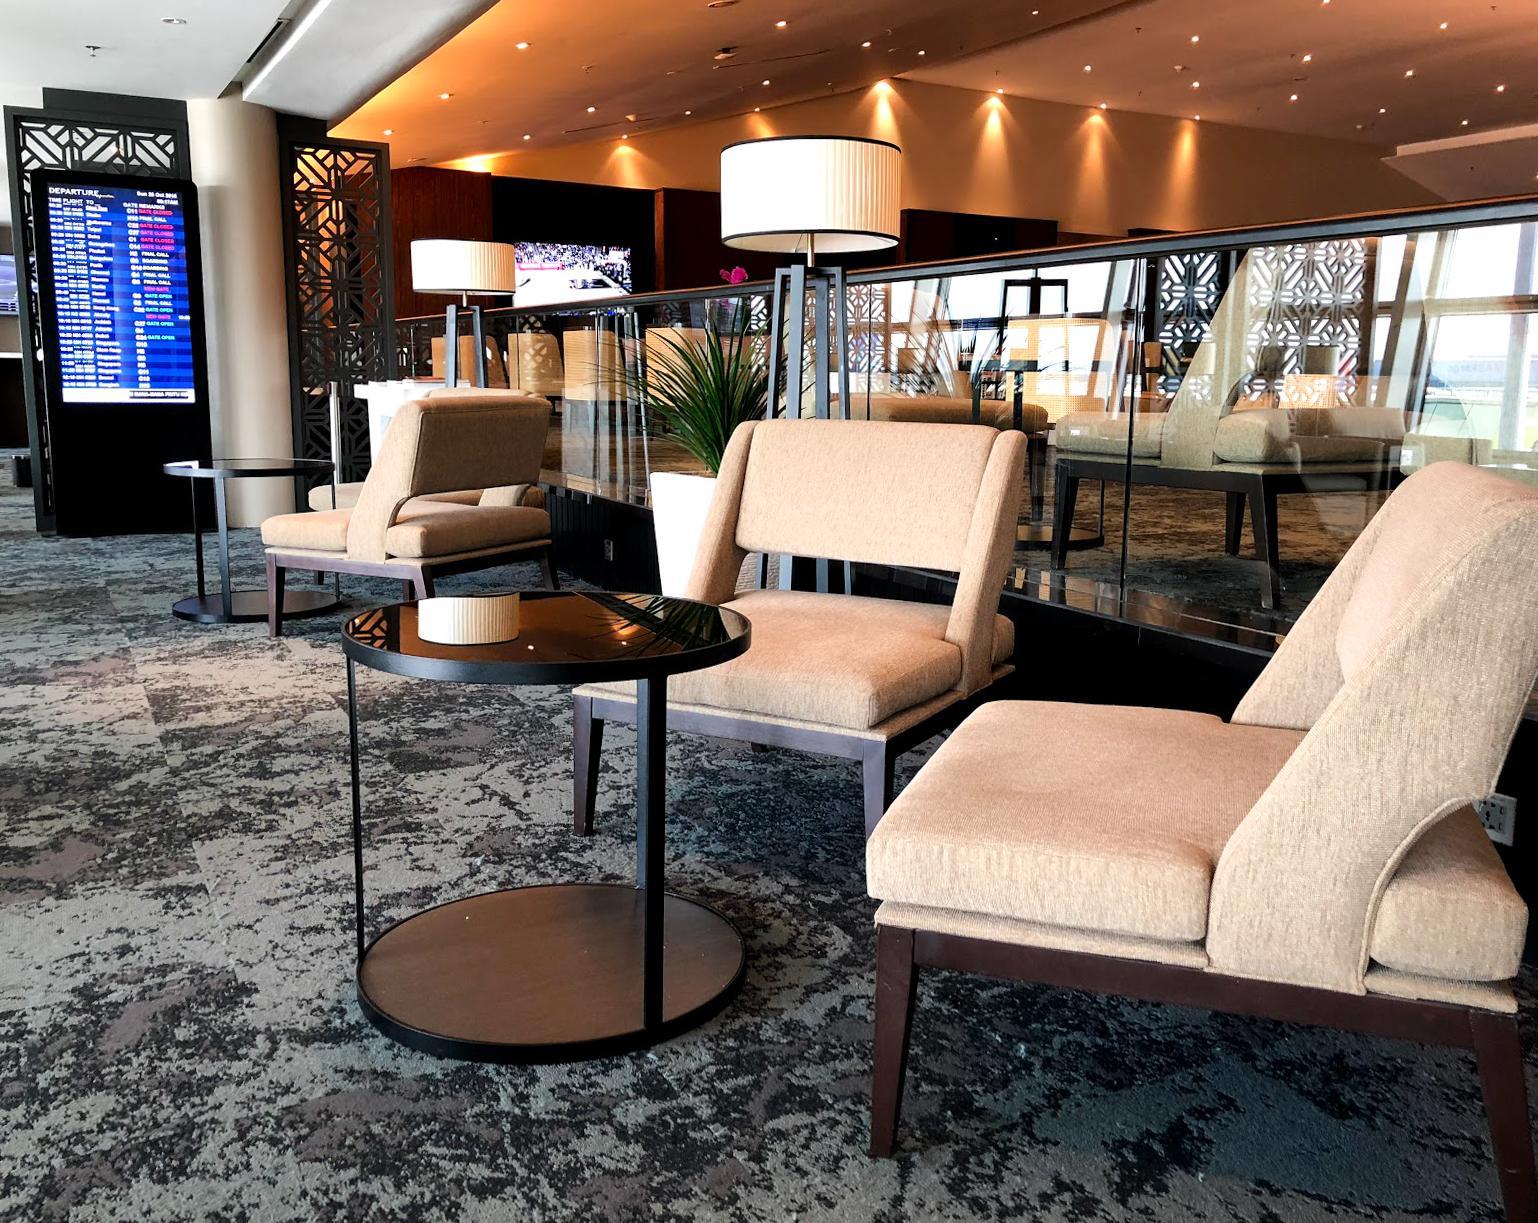 Malaysia Airlines Satellite Golden Lounge Kuala Lumpur seating area